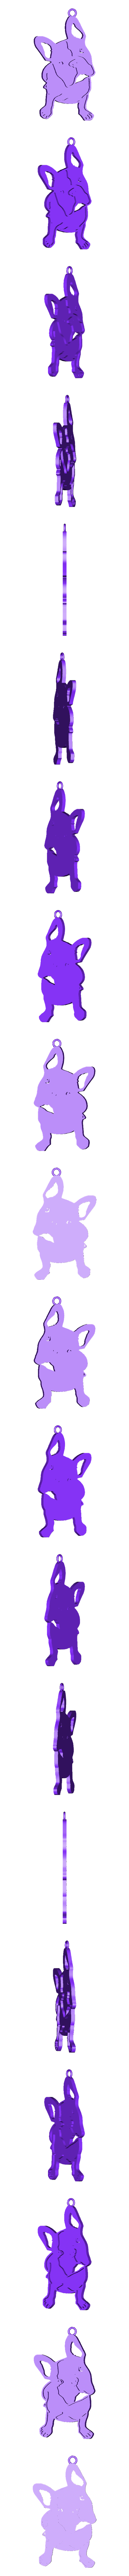 16.stl Download STL file Dogs • 3D printing object, GENNADI3313